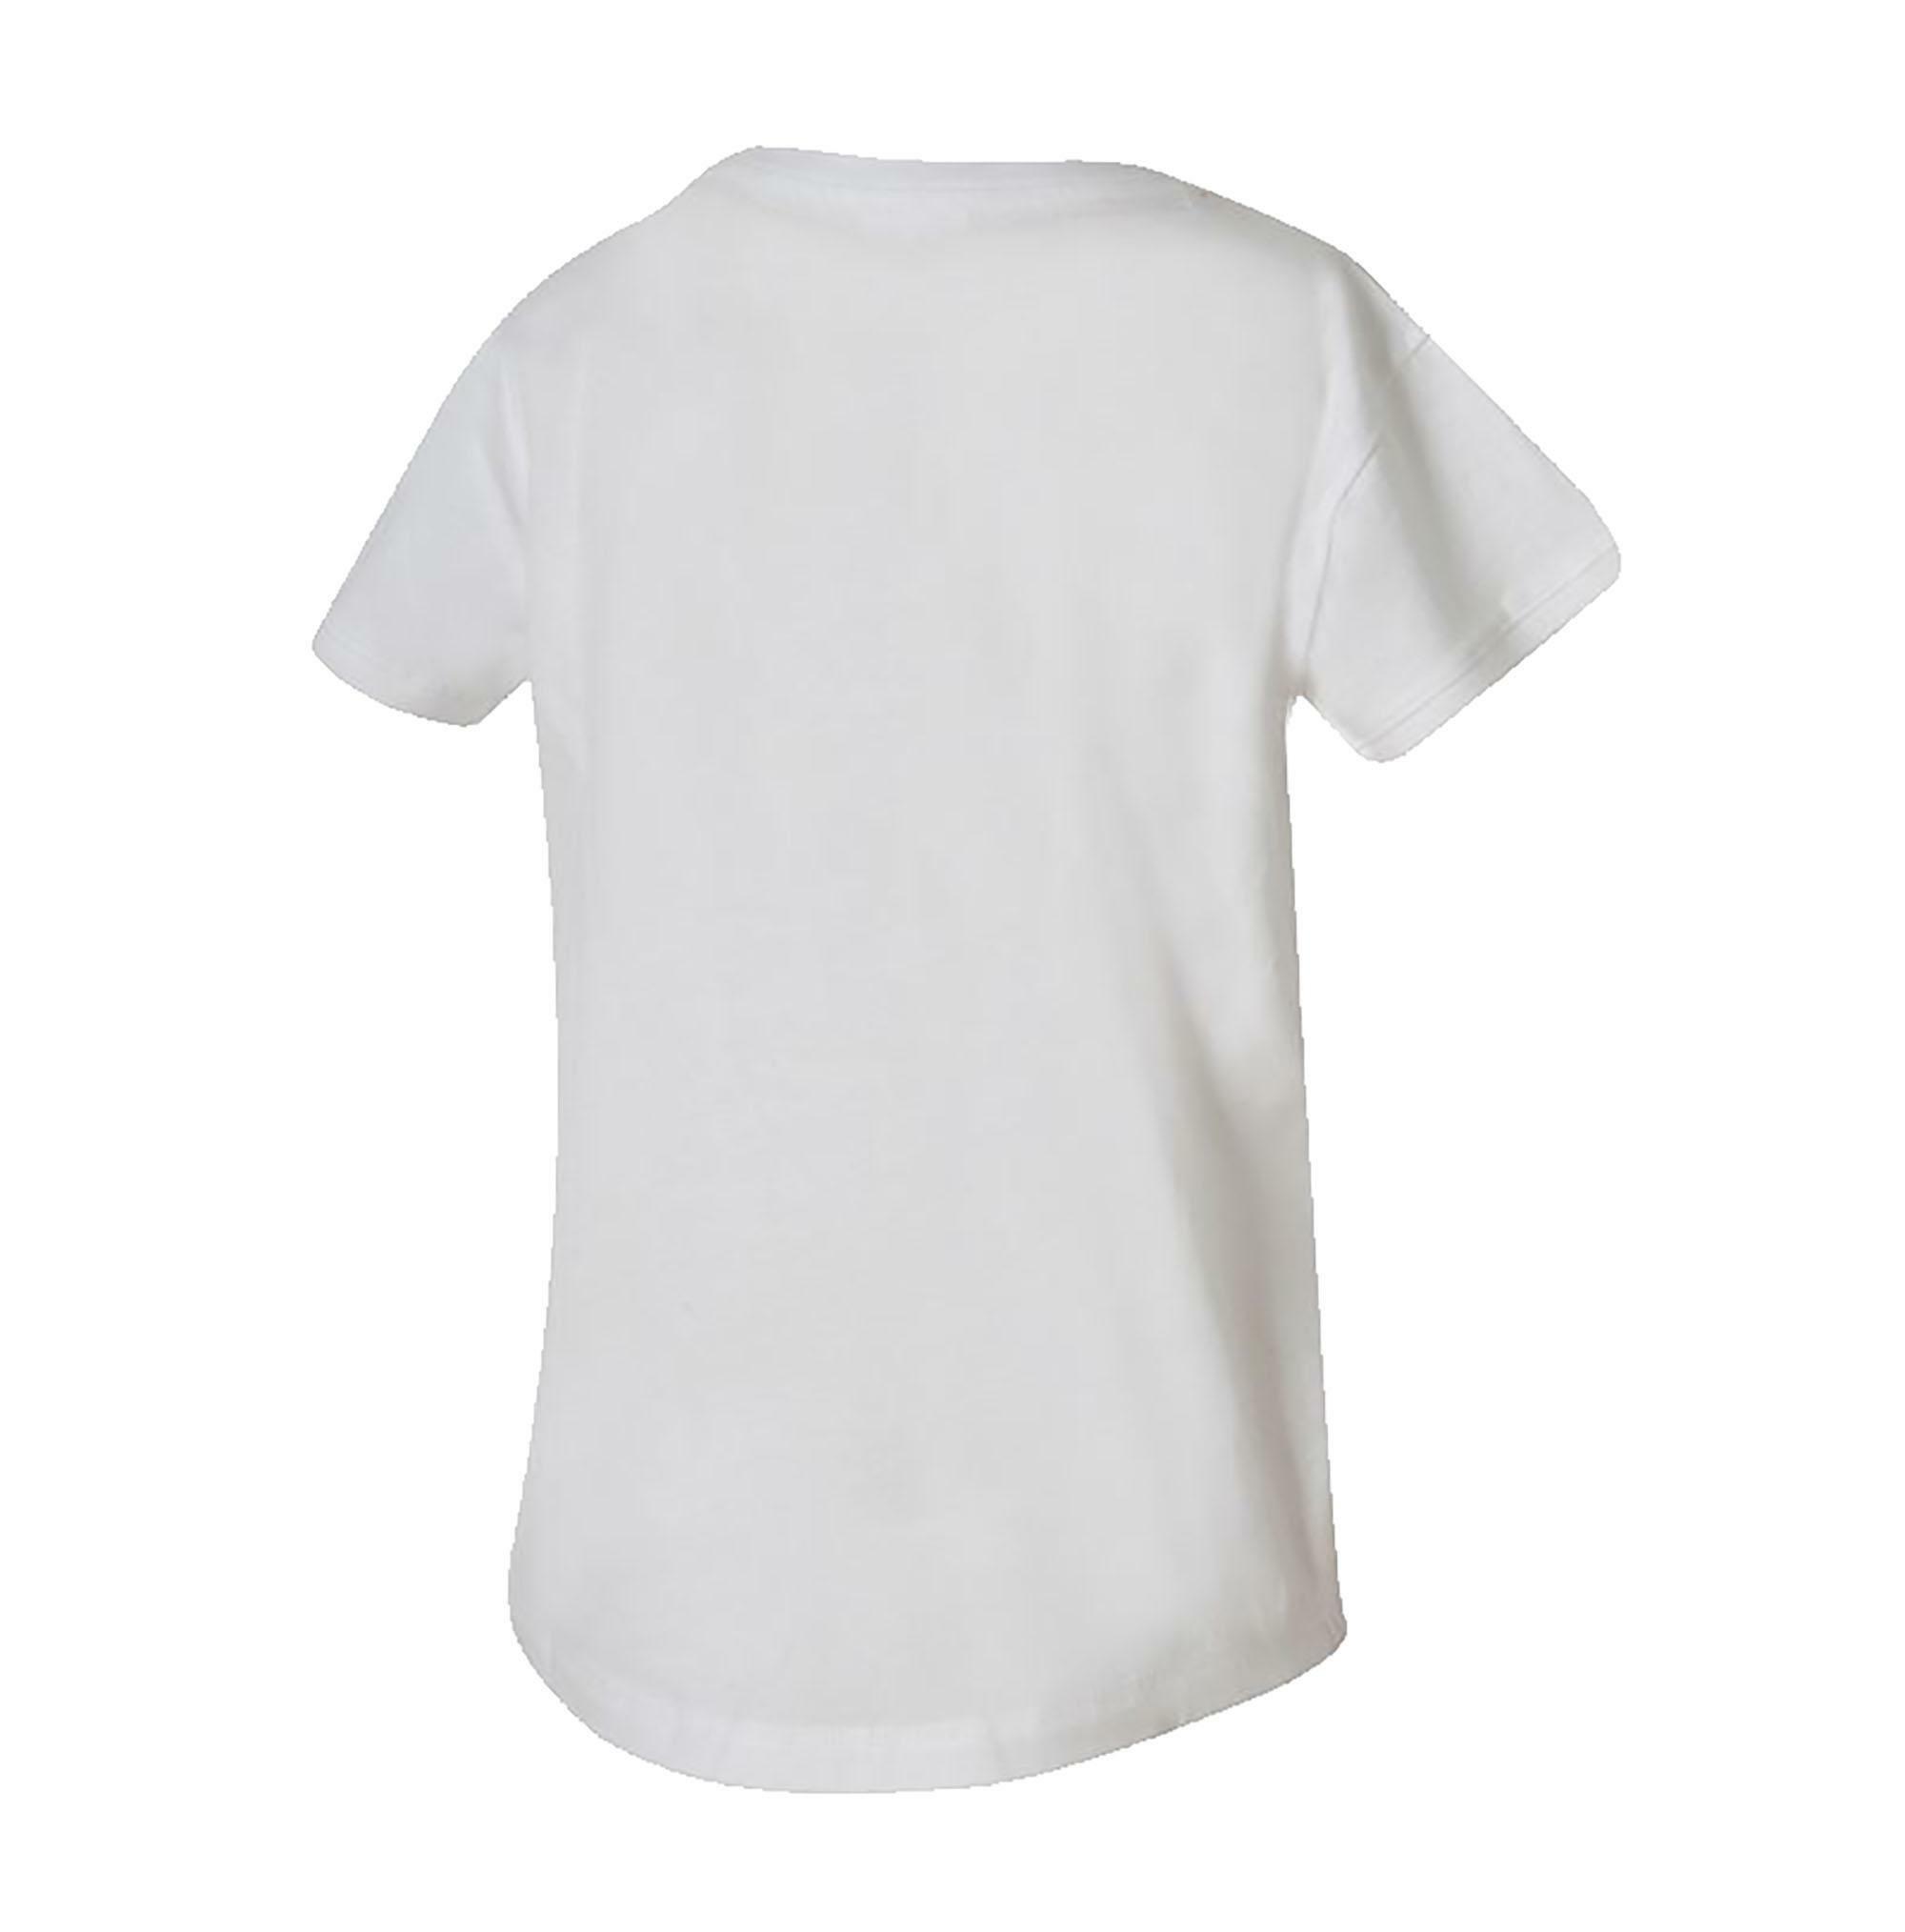 champion t-shirt bambino bianca 403597ww001